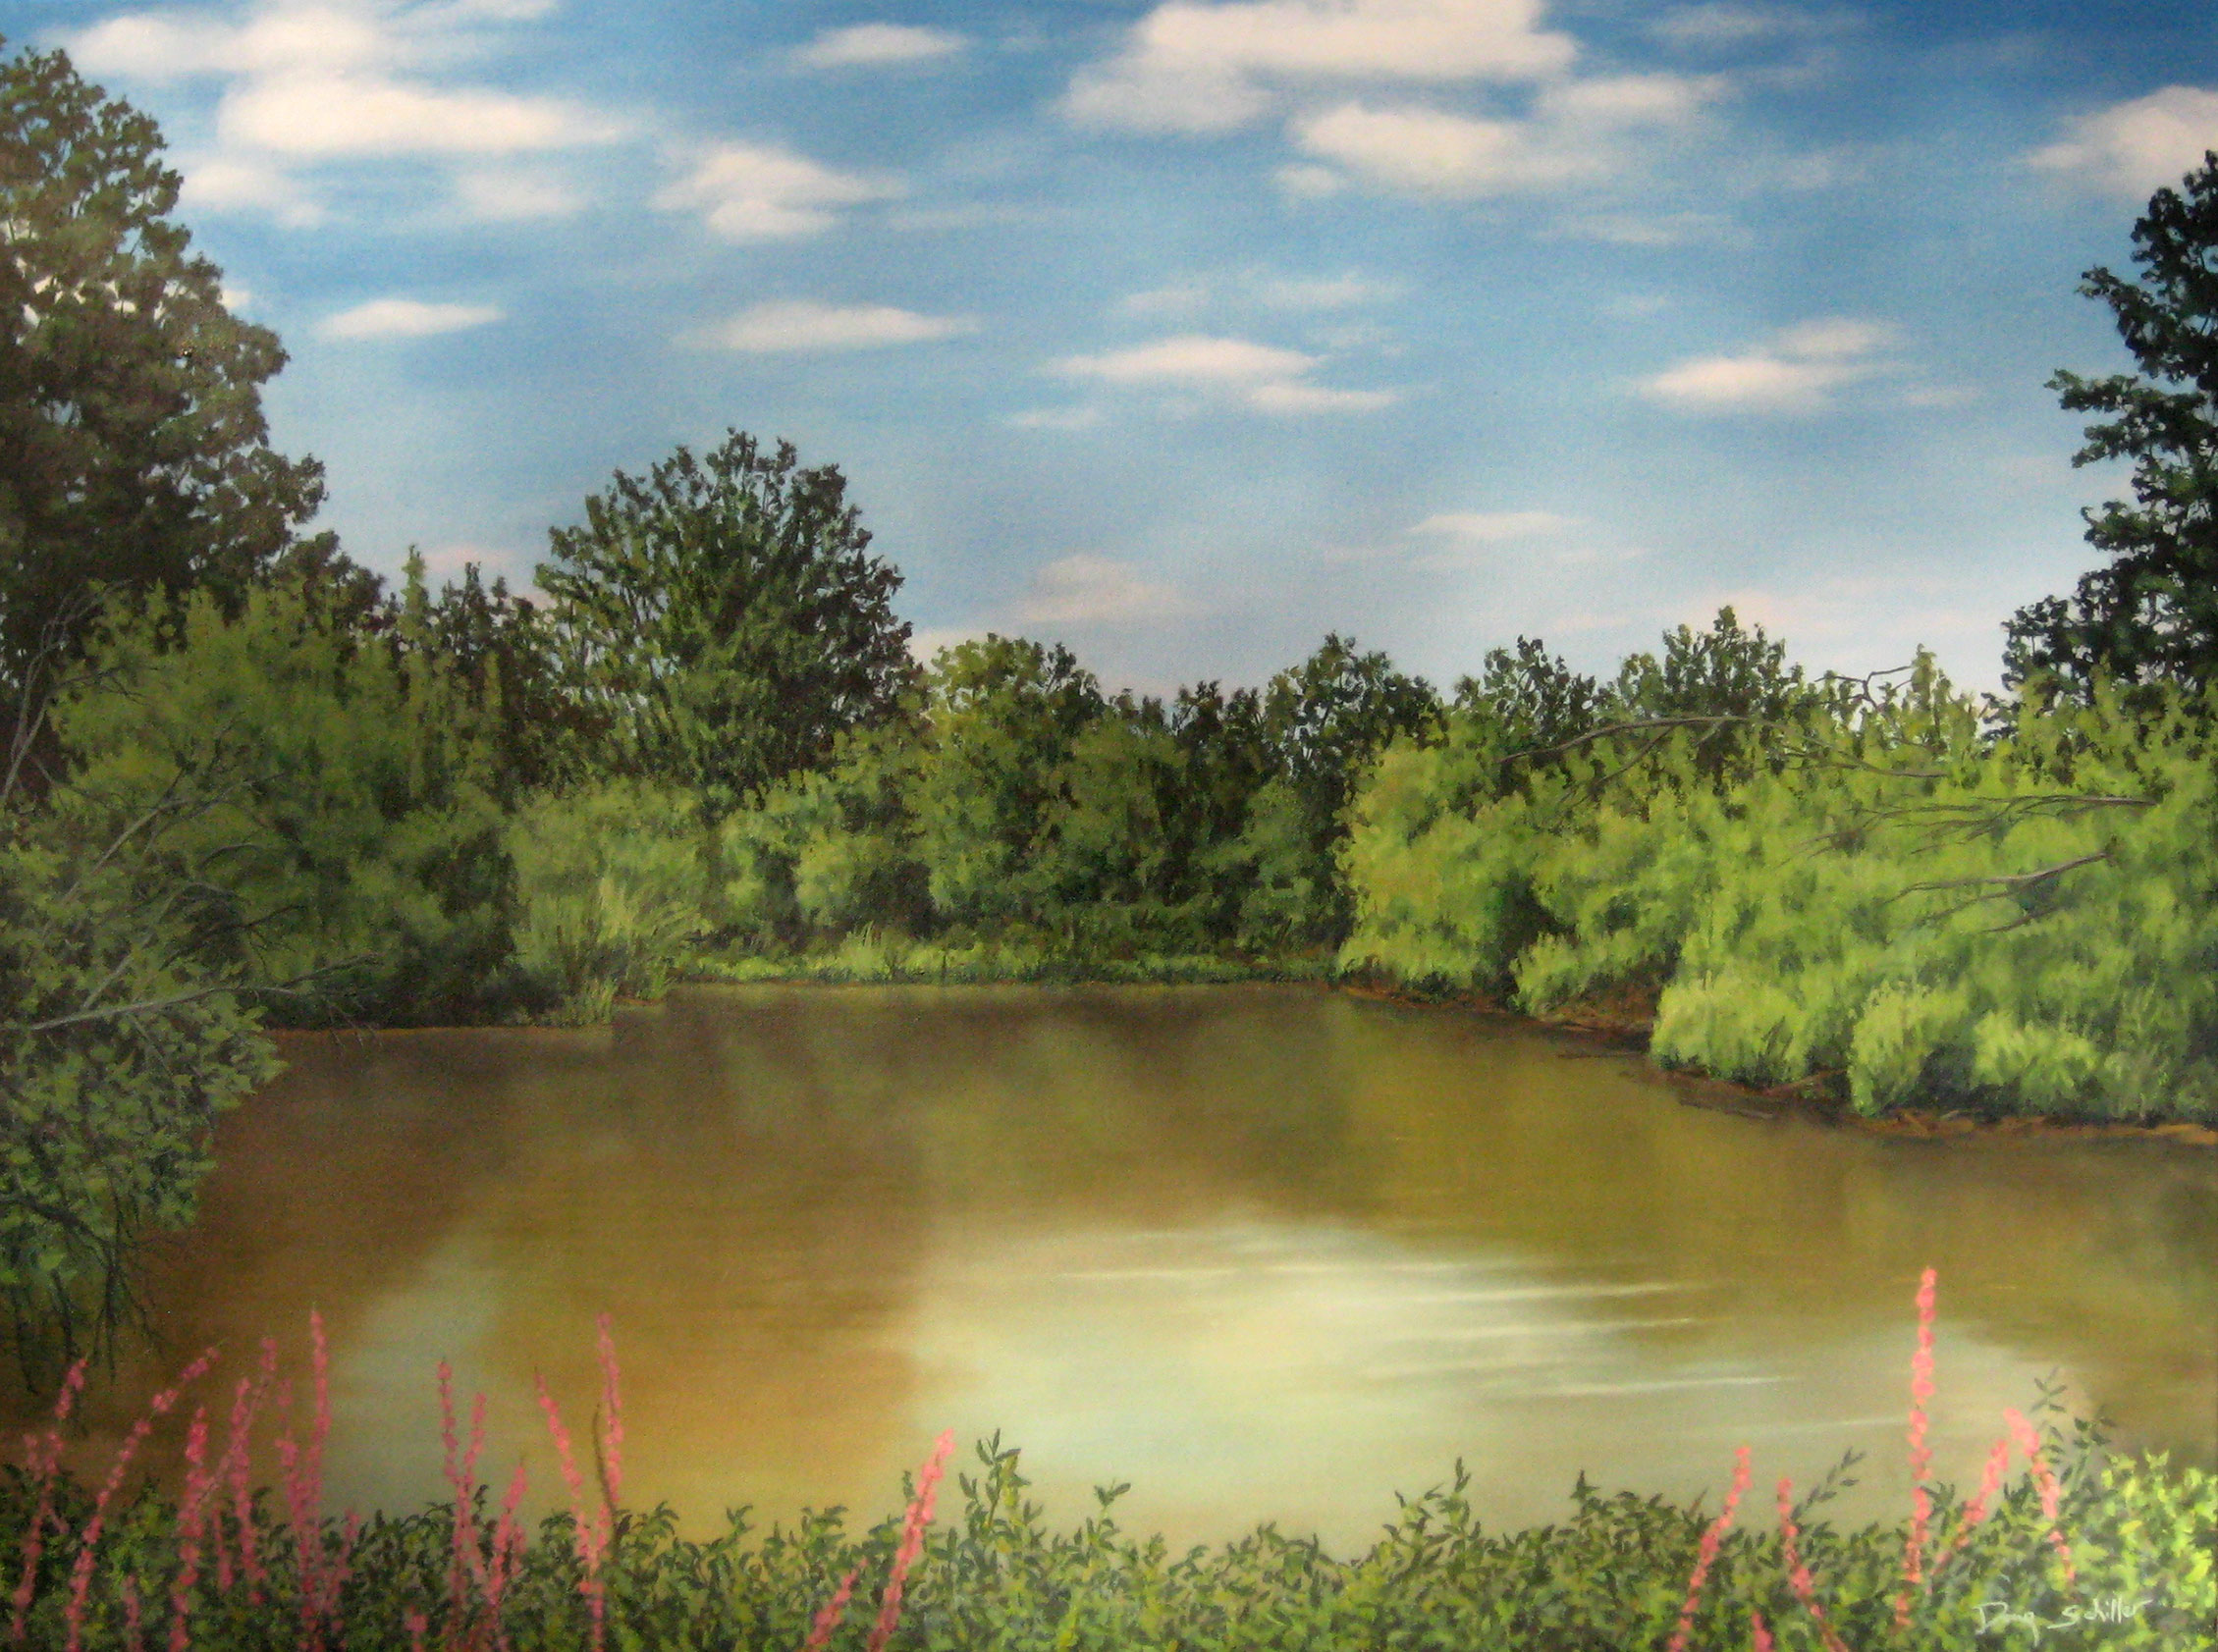 Doug Schiller, The Great Swamp, Branta Pond